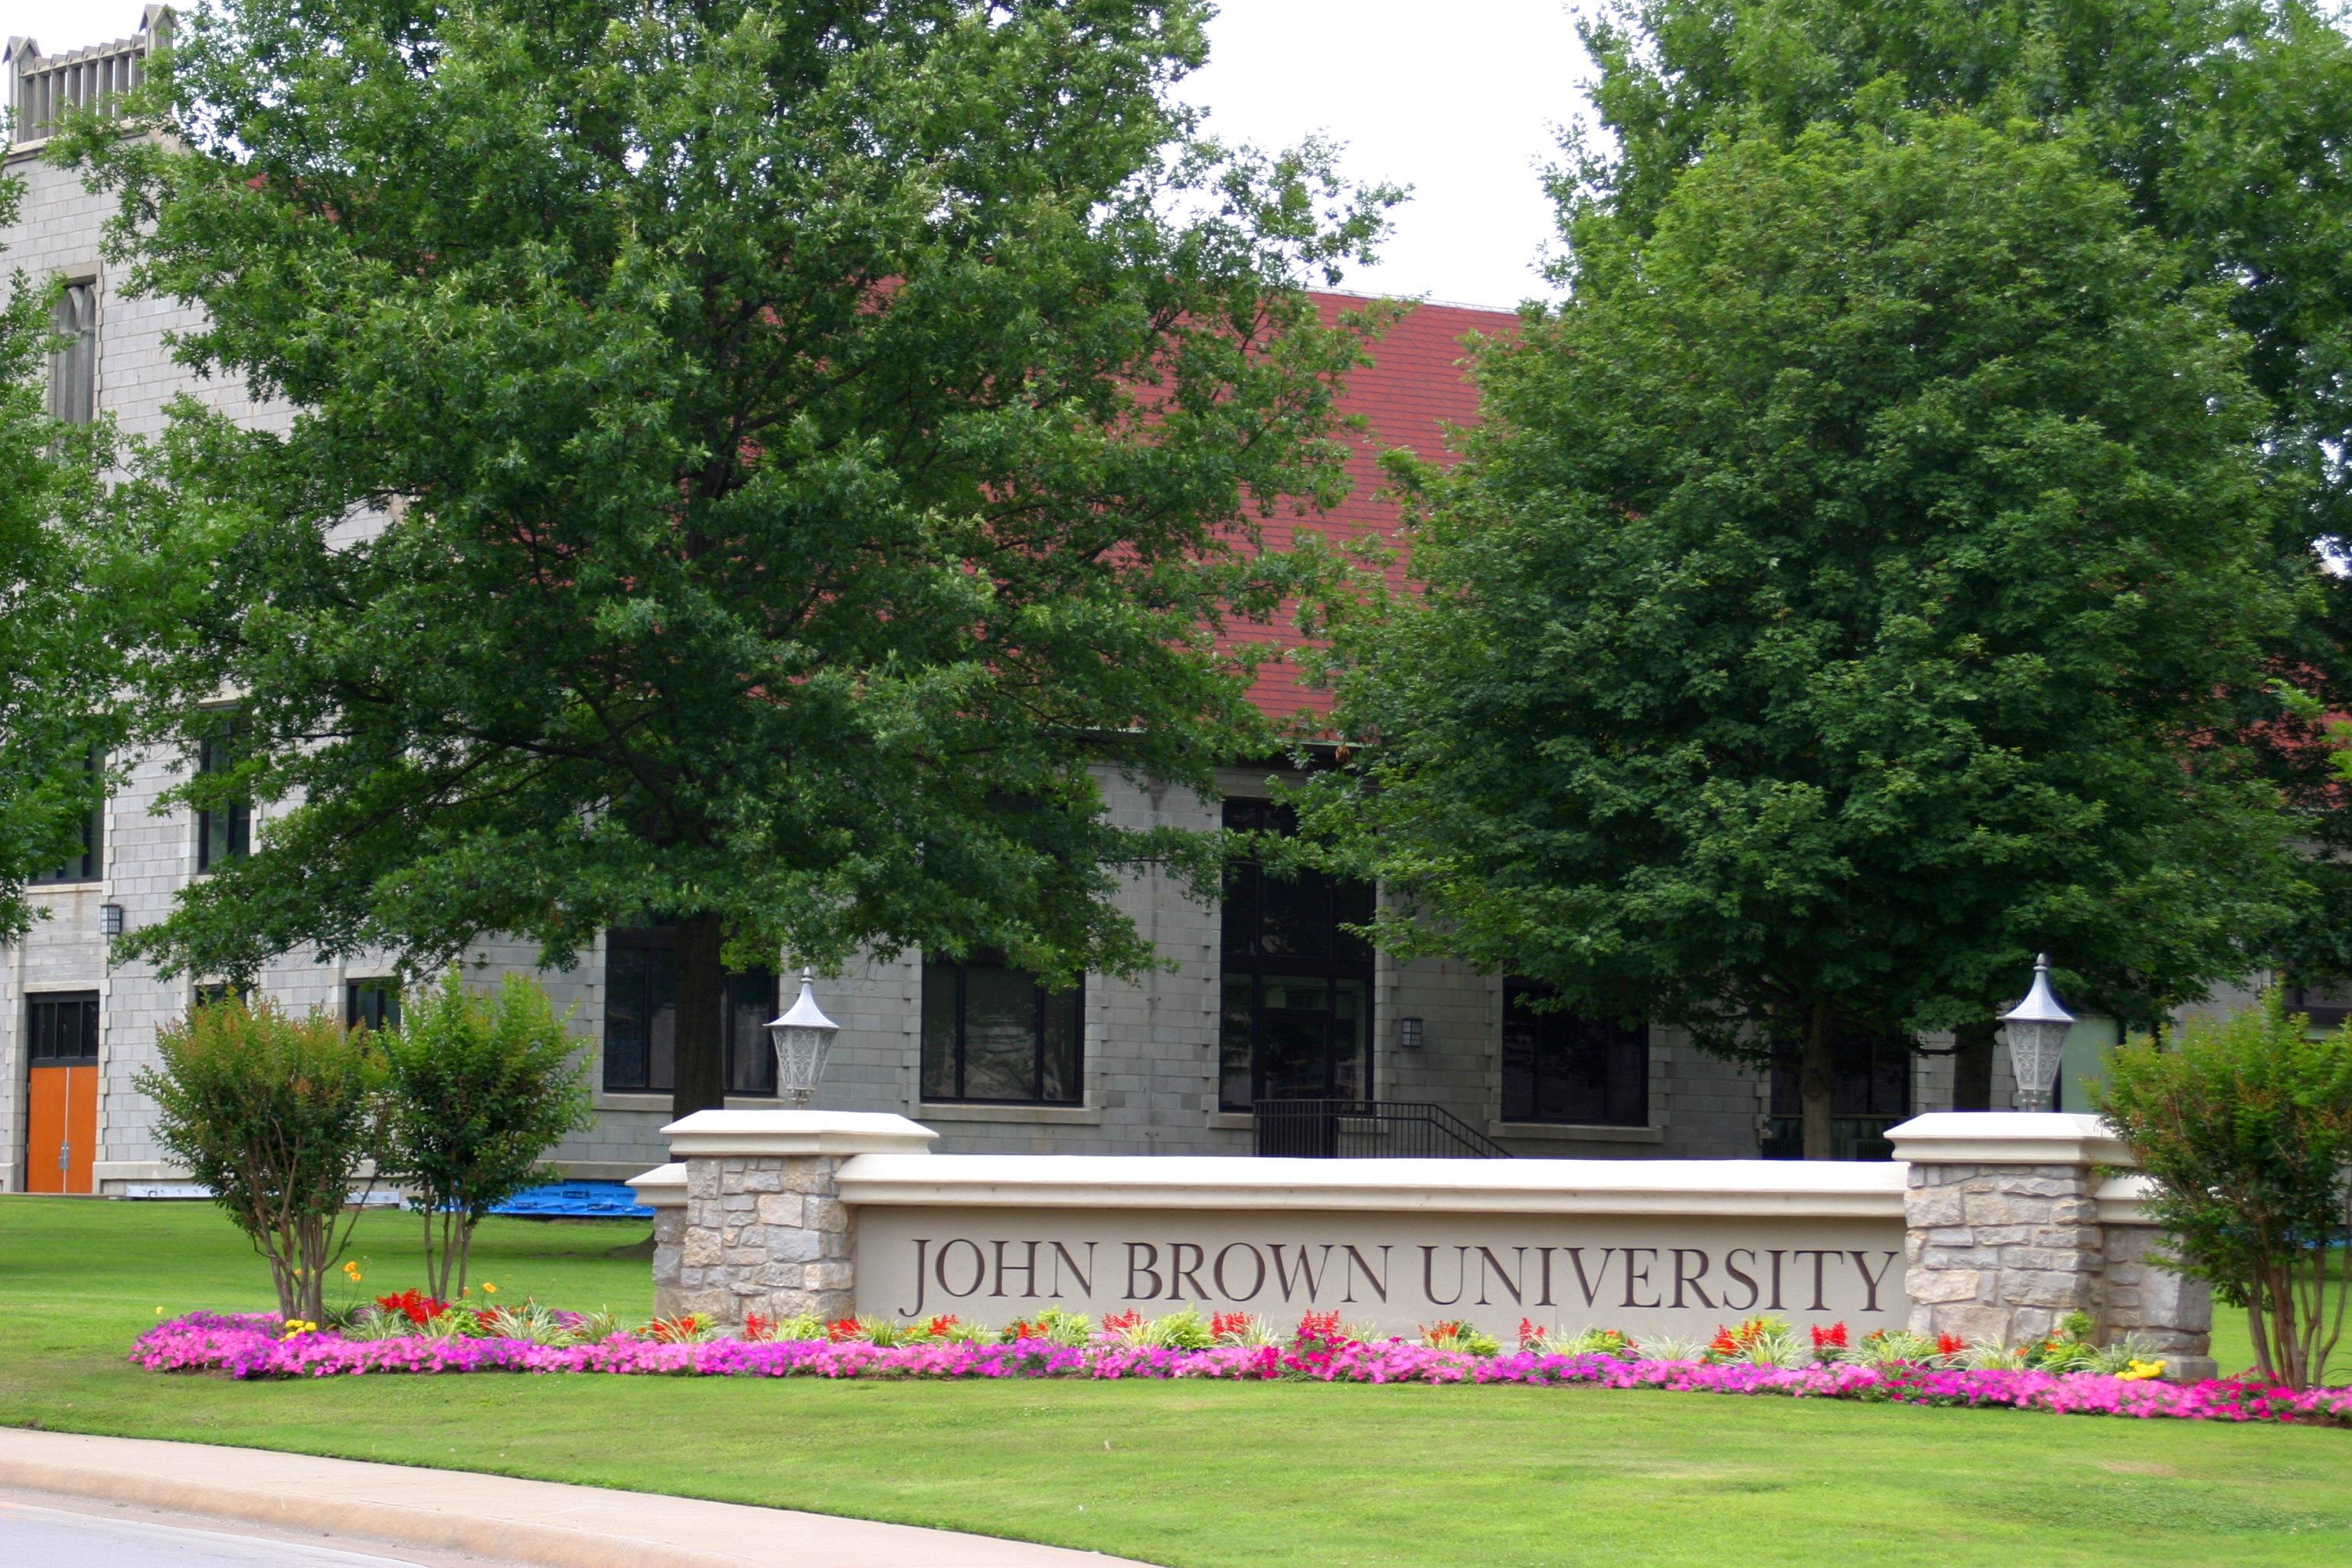 Add John Brown University